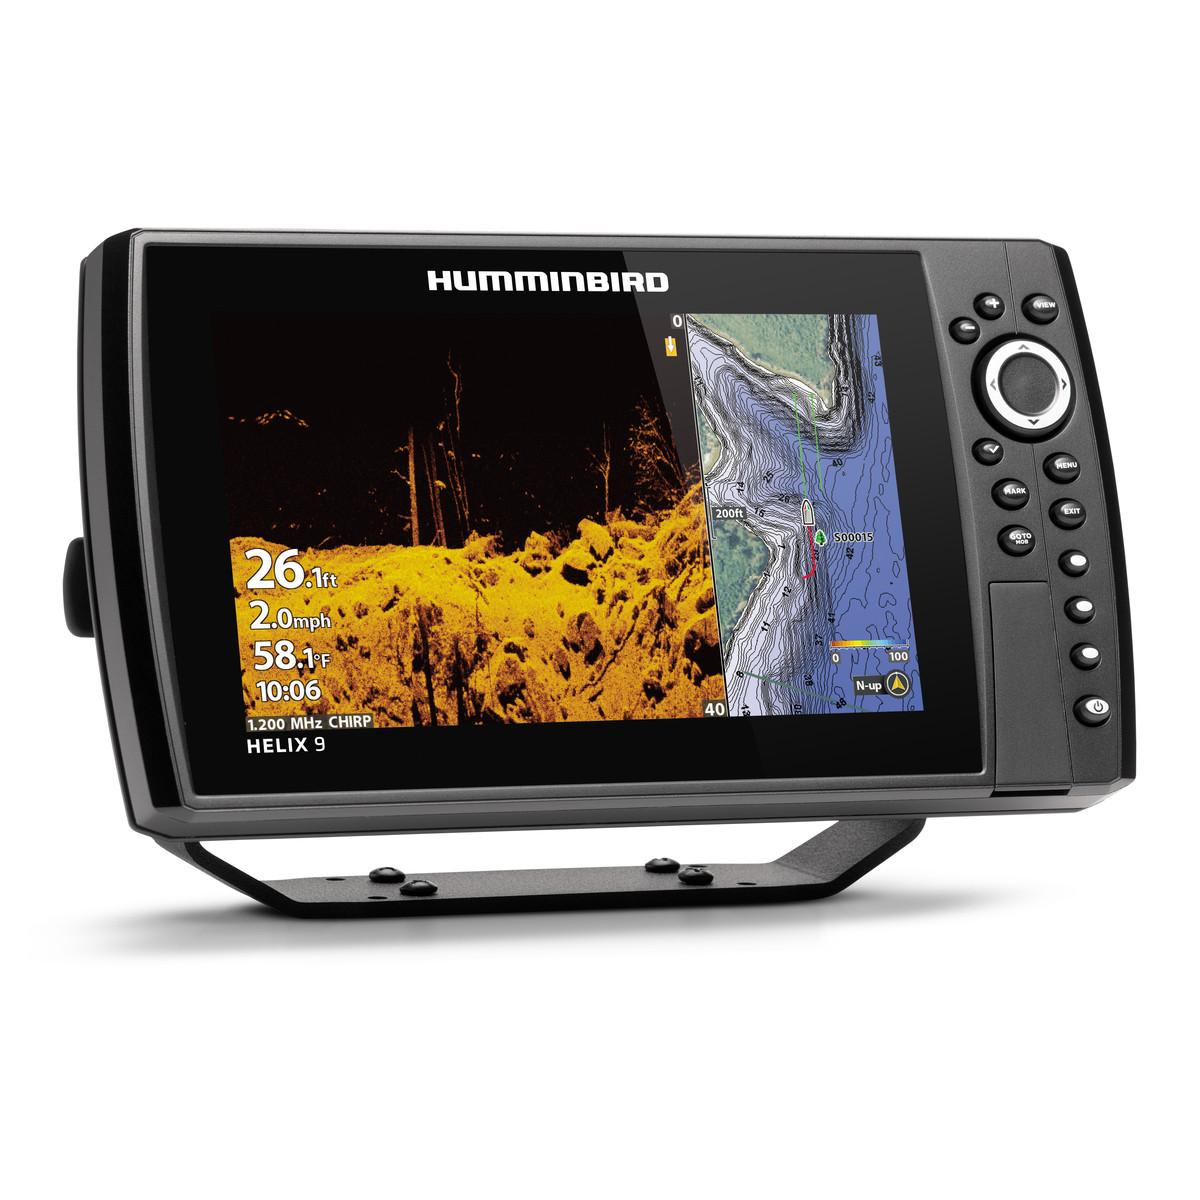 Ехолот Картплотер Humminbird HELIX 9 CHIRP MEGA SI+ GPS G3N